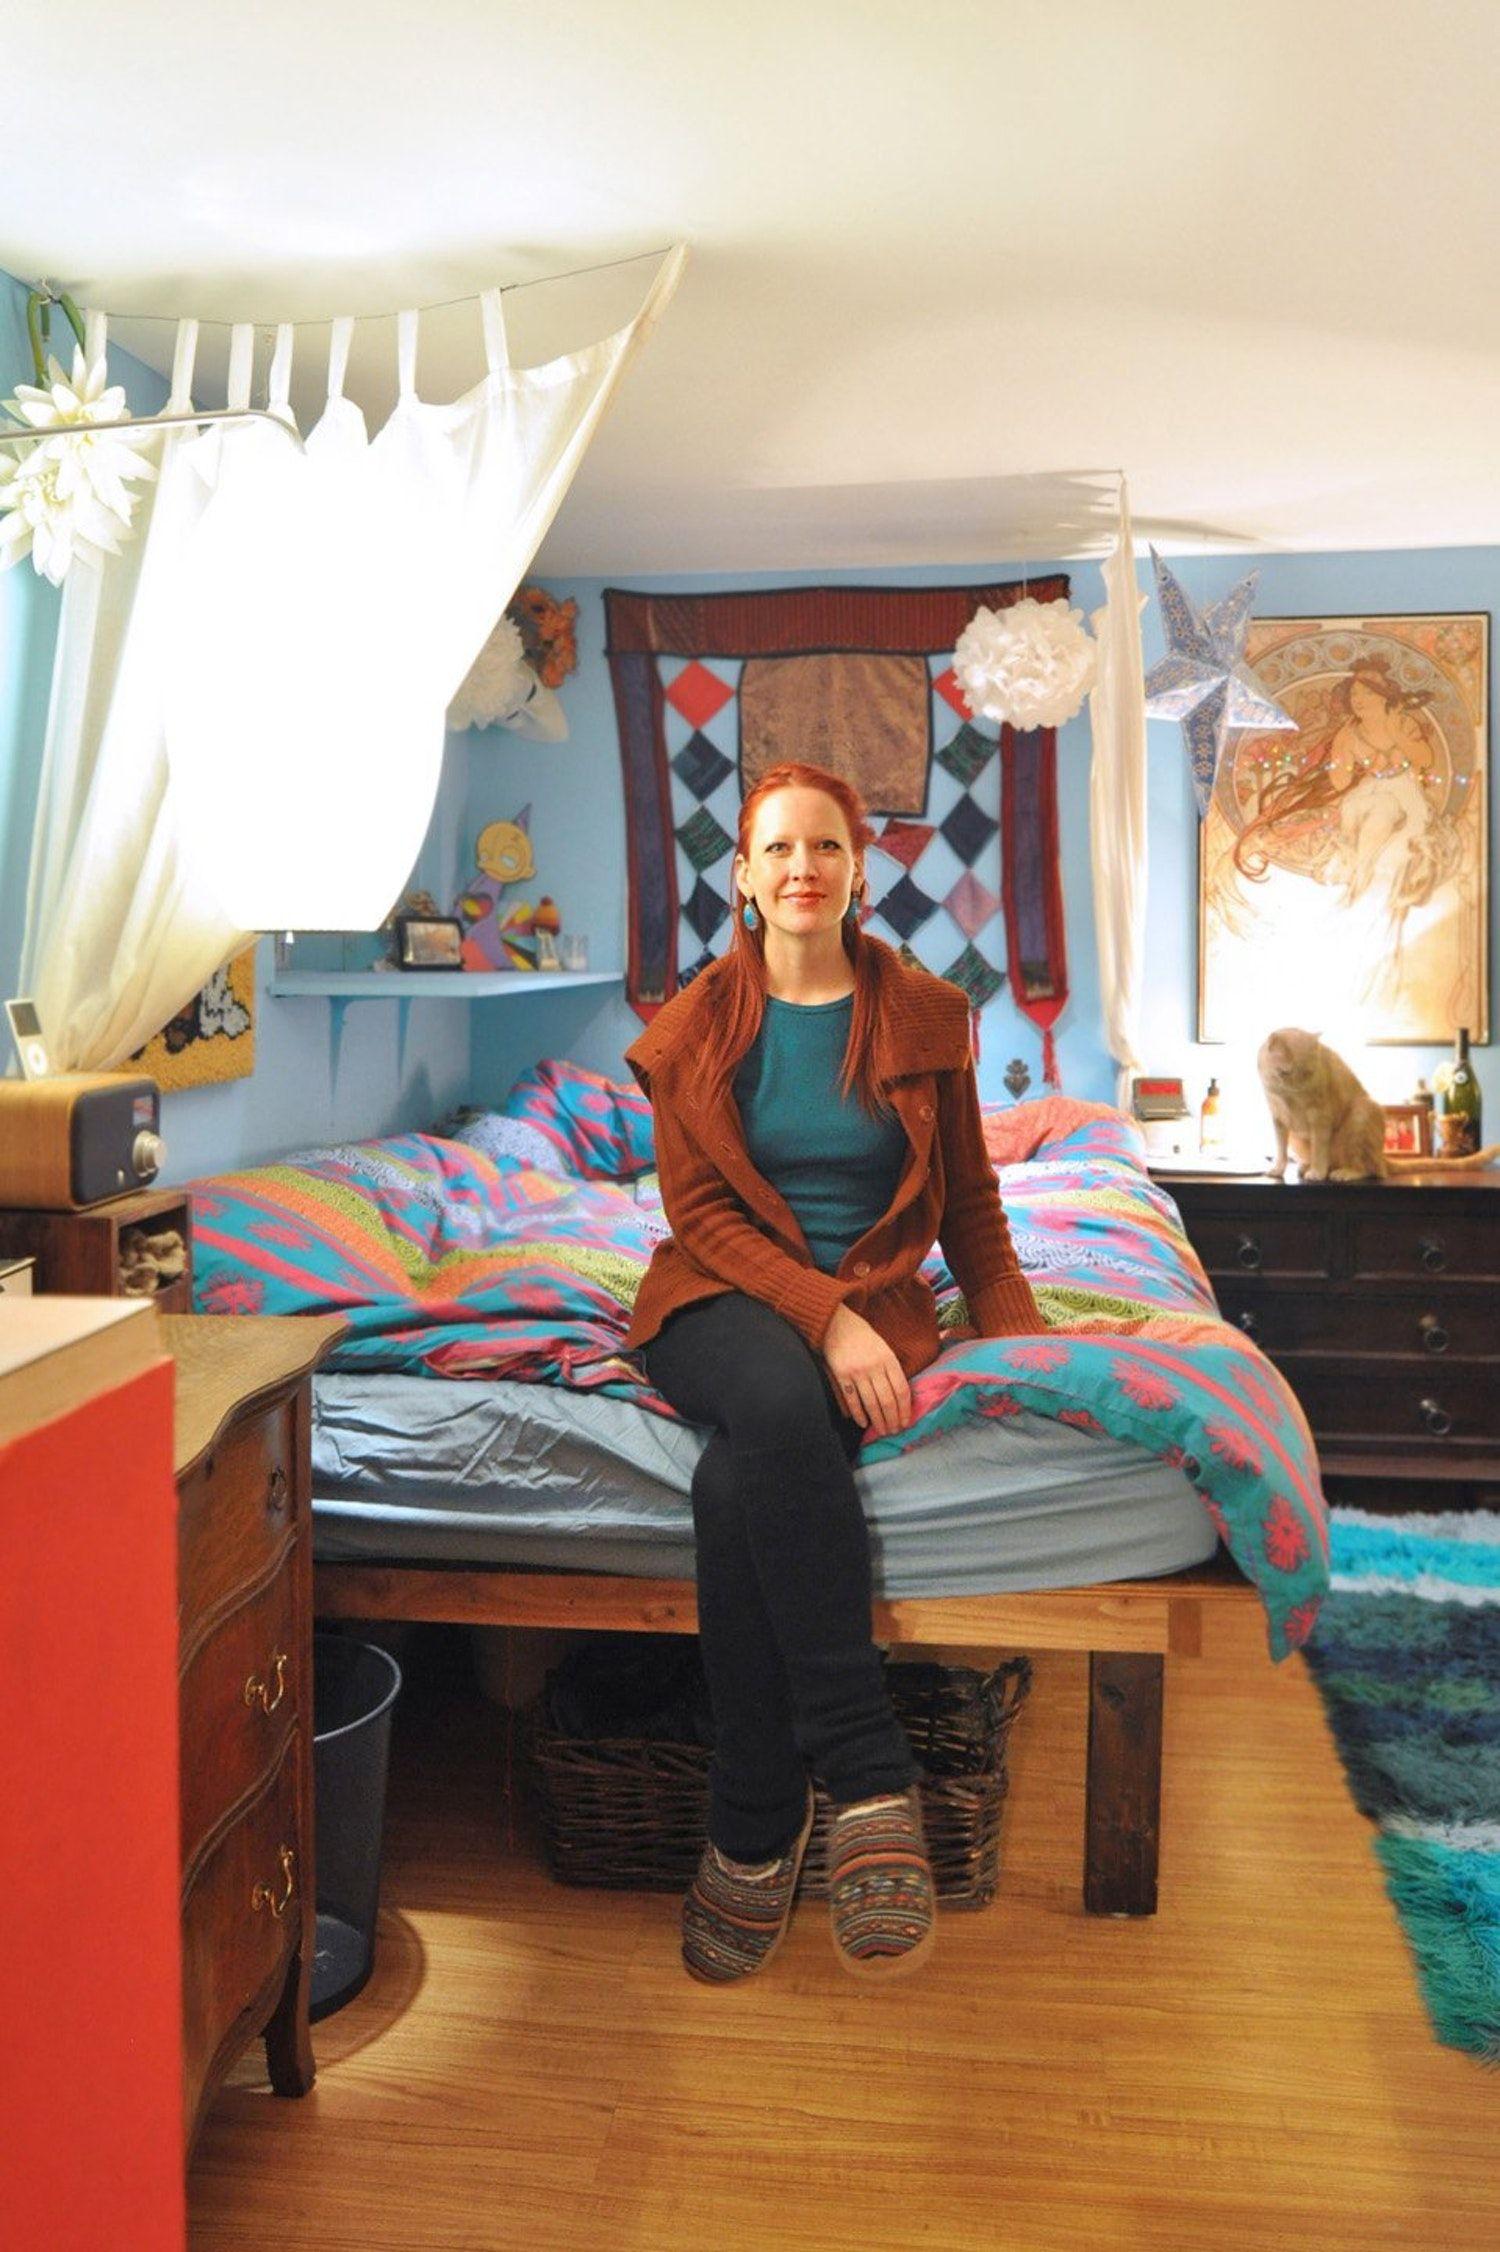 Laura Lee's Bright & Playful Basement Studio Basement